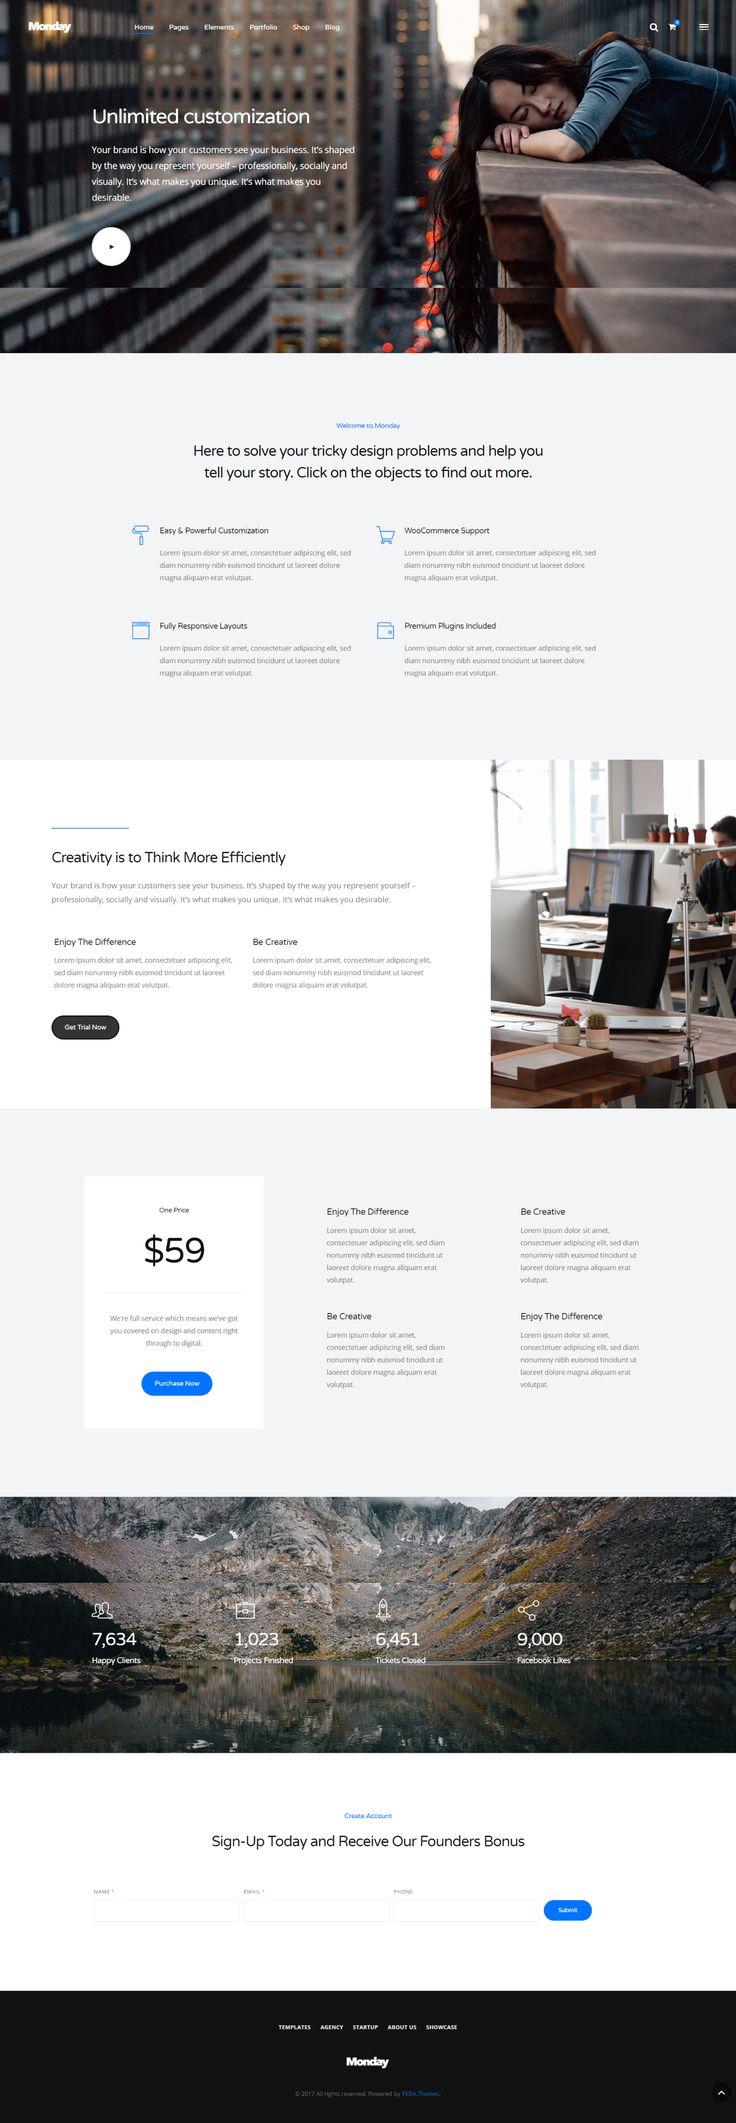 - f28d4253e02da8ffd79dfdbe88c6746b - Monday is a multi-purpose, modern, trendy, clean, creative, and powerful WordPress Theme